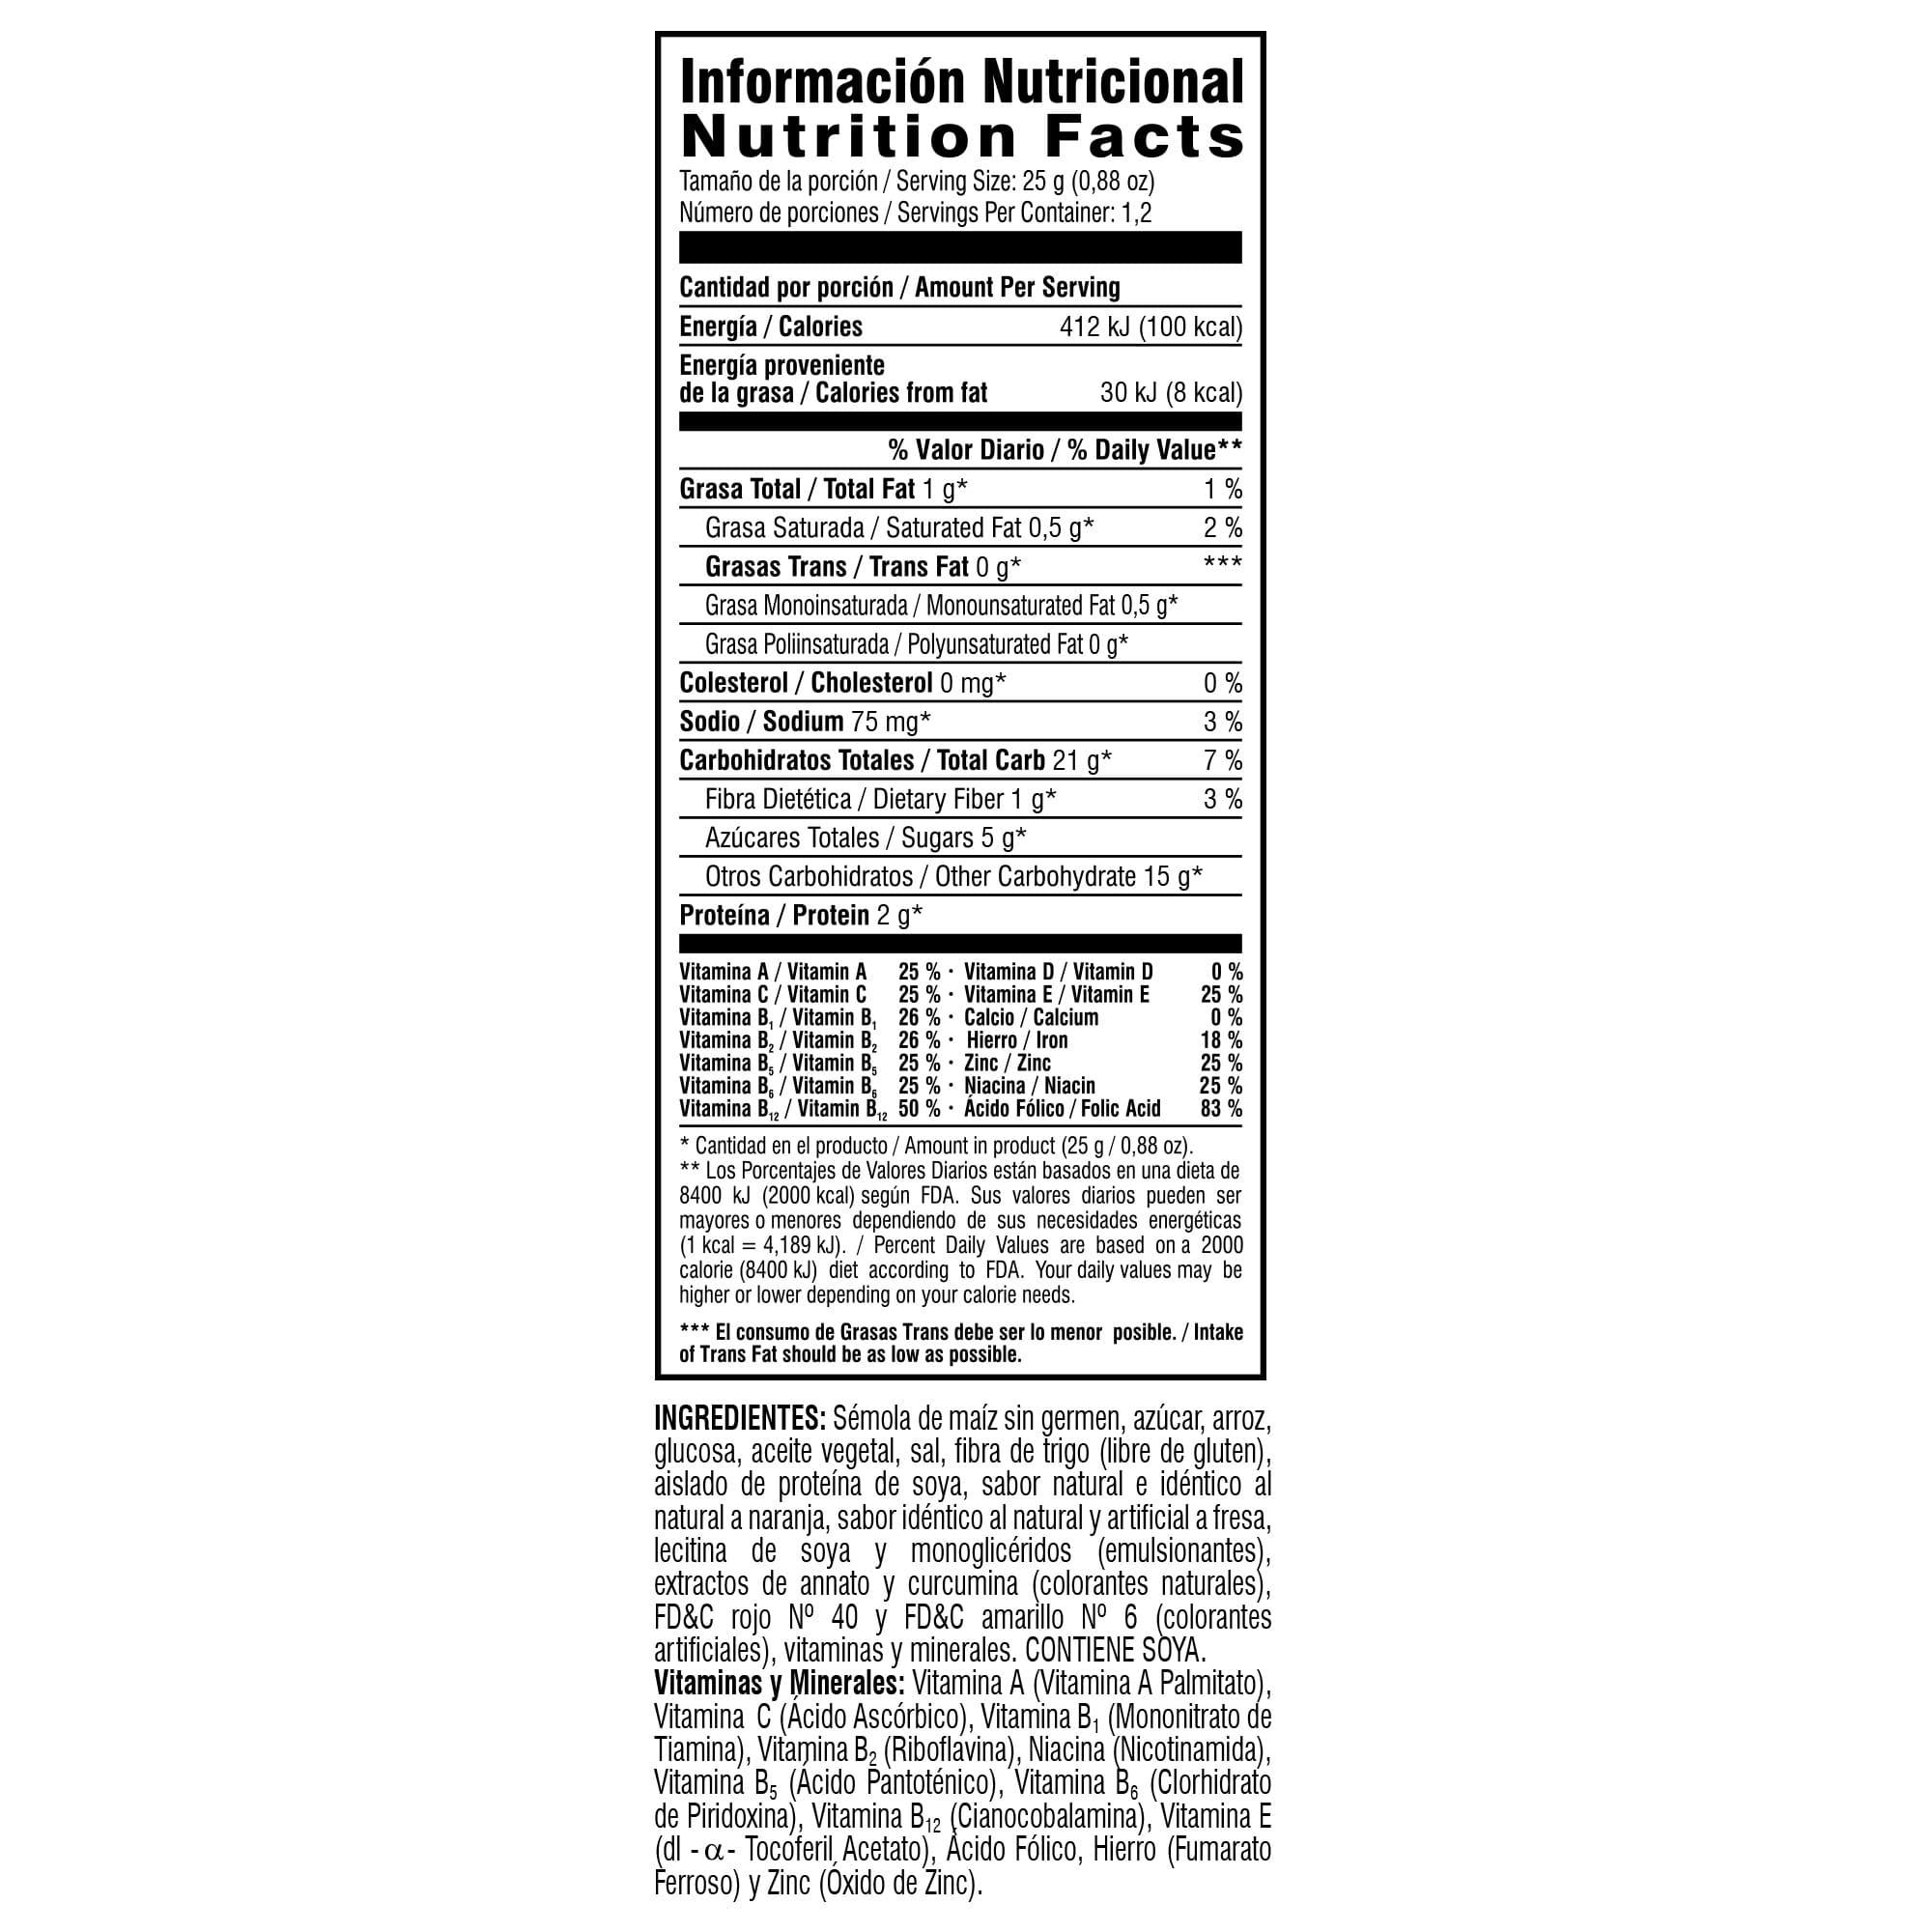 FUSION MIX-Naranitas y Roditas Inf Nutric pag web